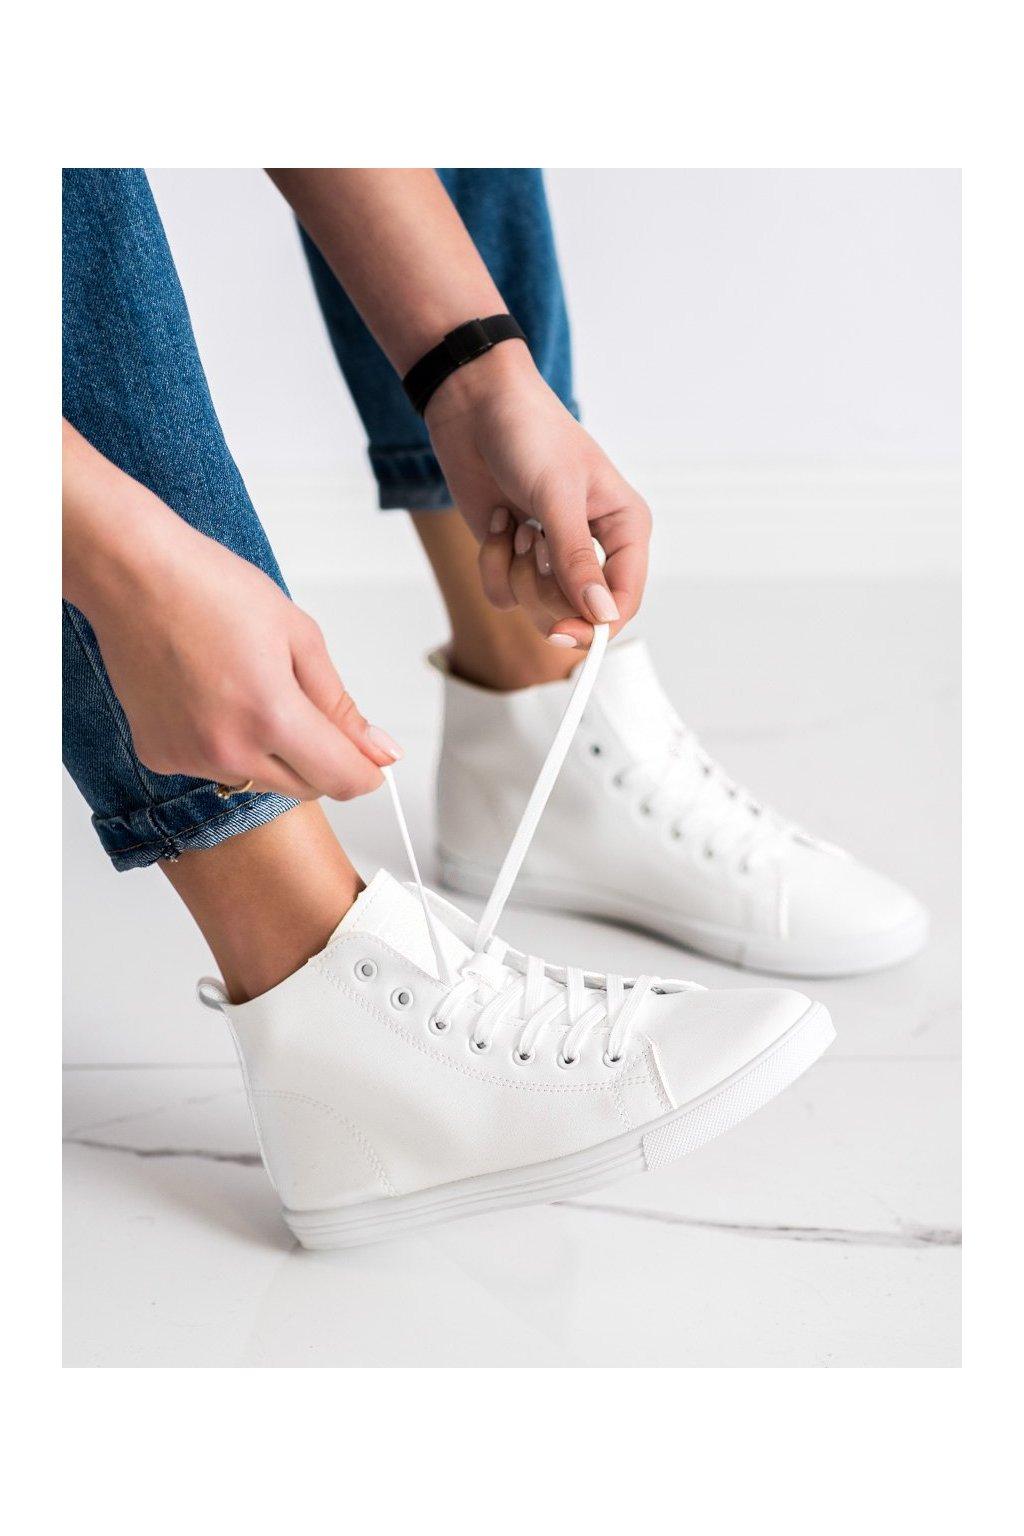 Biele tenisky Ideal shoes kod LX-9858W